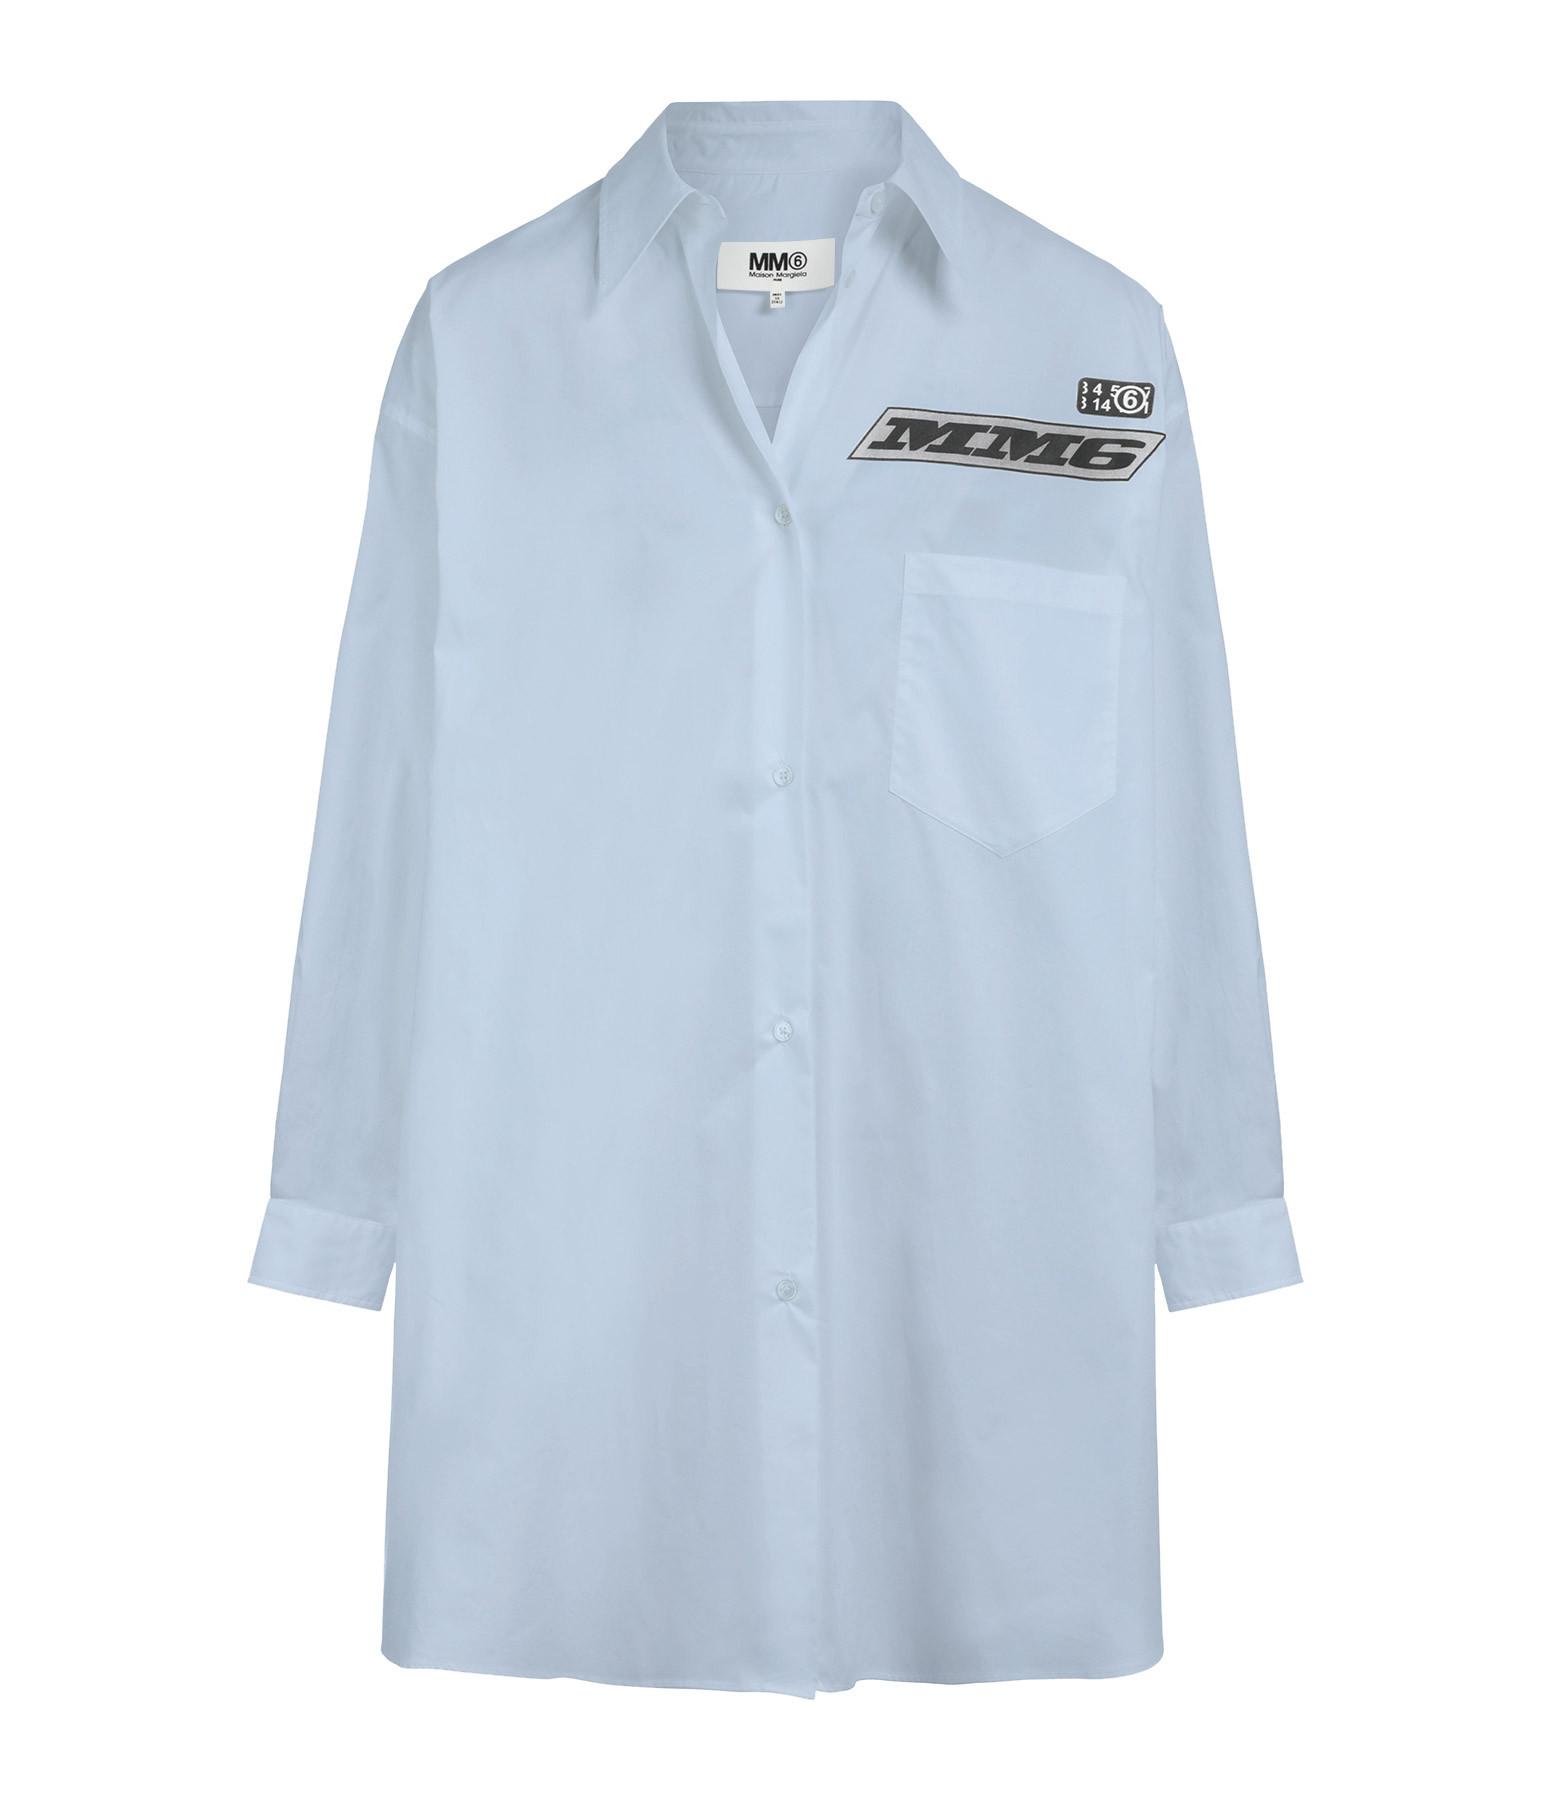 MM6 MAISON MARGIELA - Robe Chemise Oversize Coton Popeline Bleu Ciel